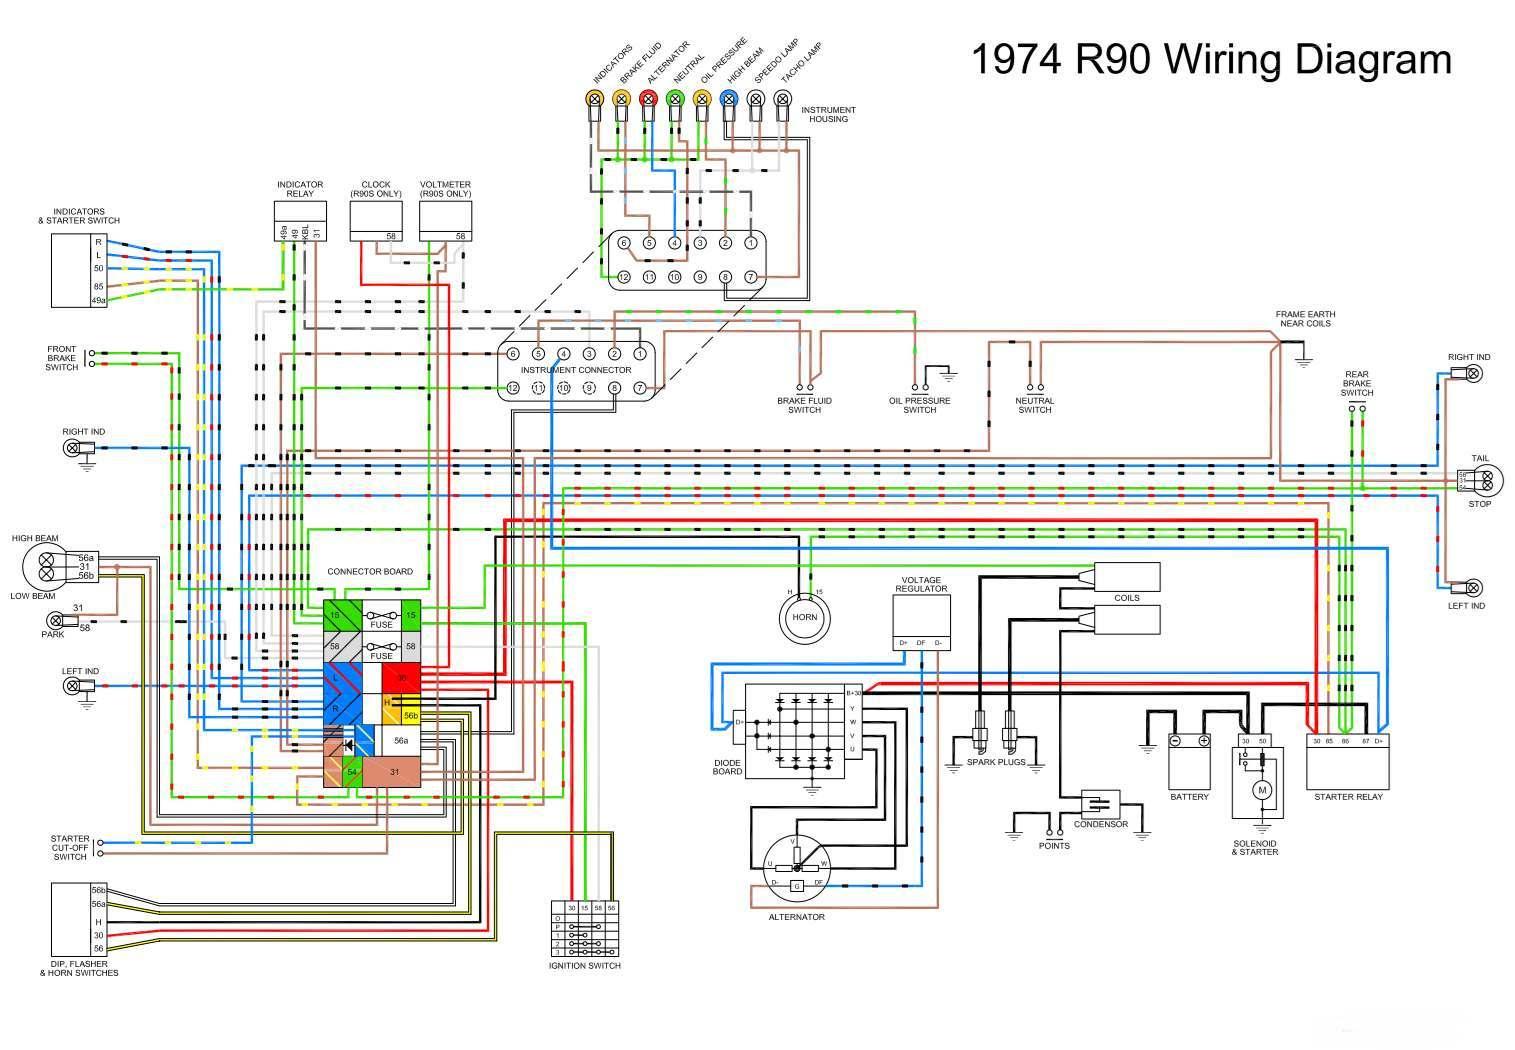 Big Dog Wiring Schematics Detailed Diagram 2008 Diy Enthusiasts Diagrams U2022 Schematic